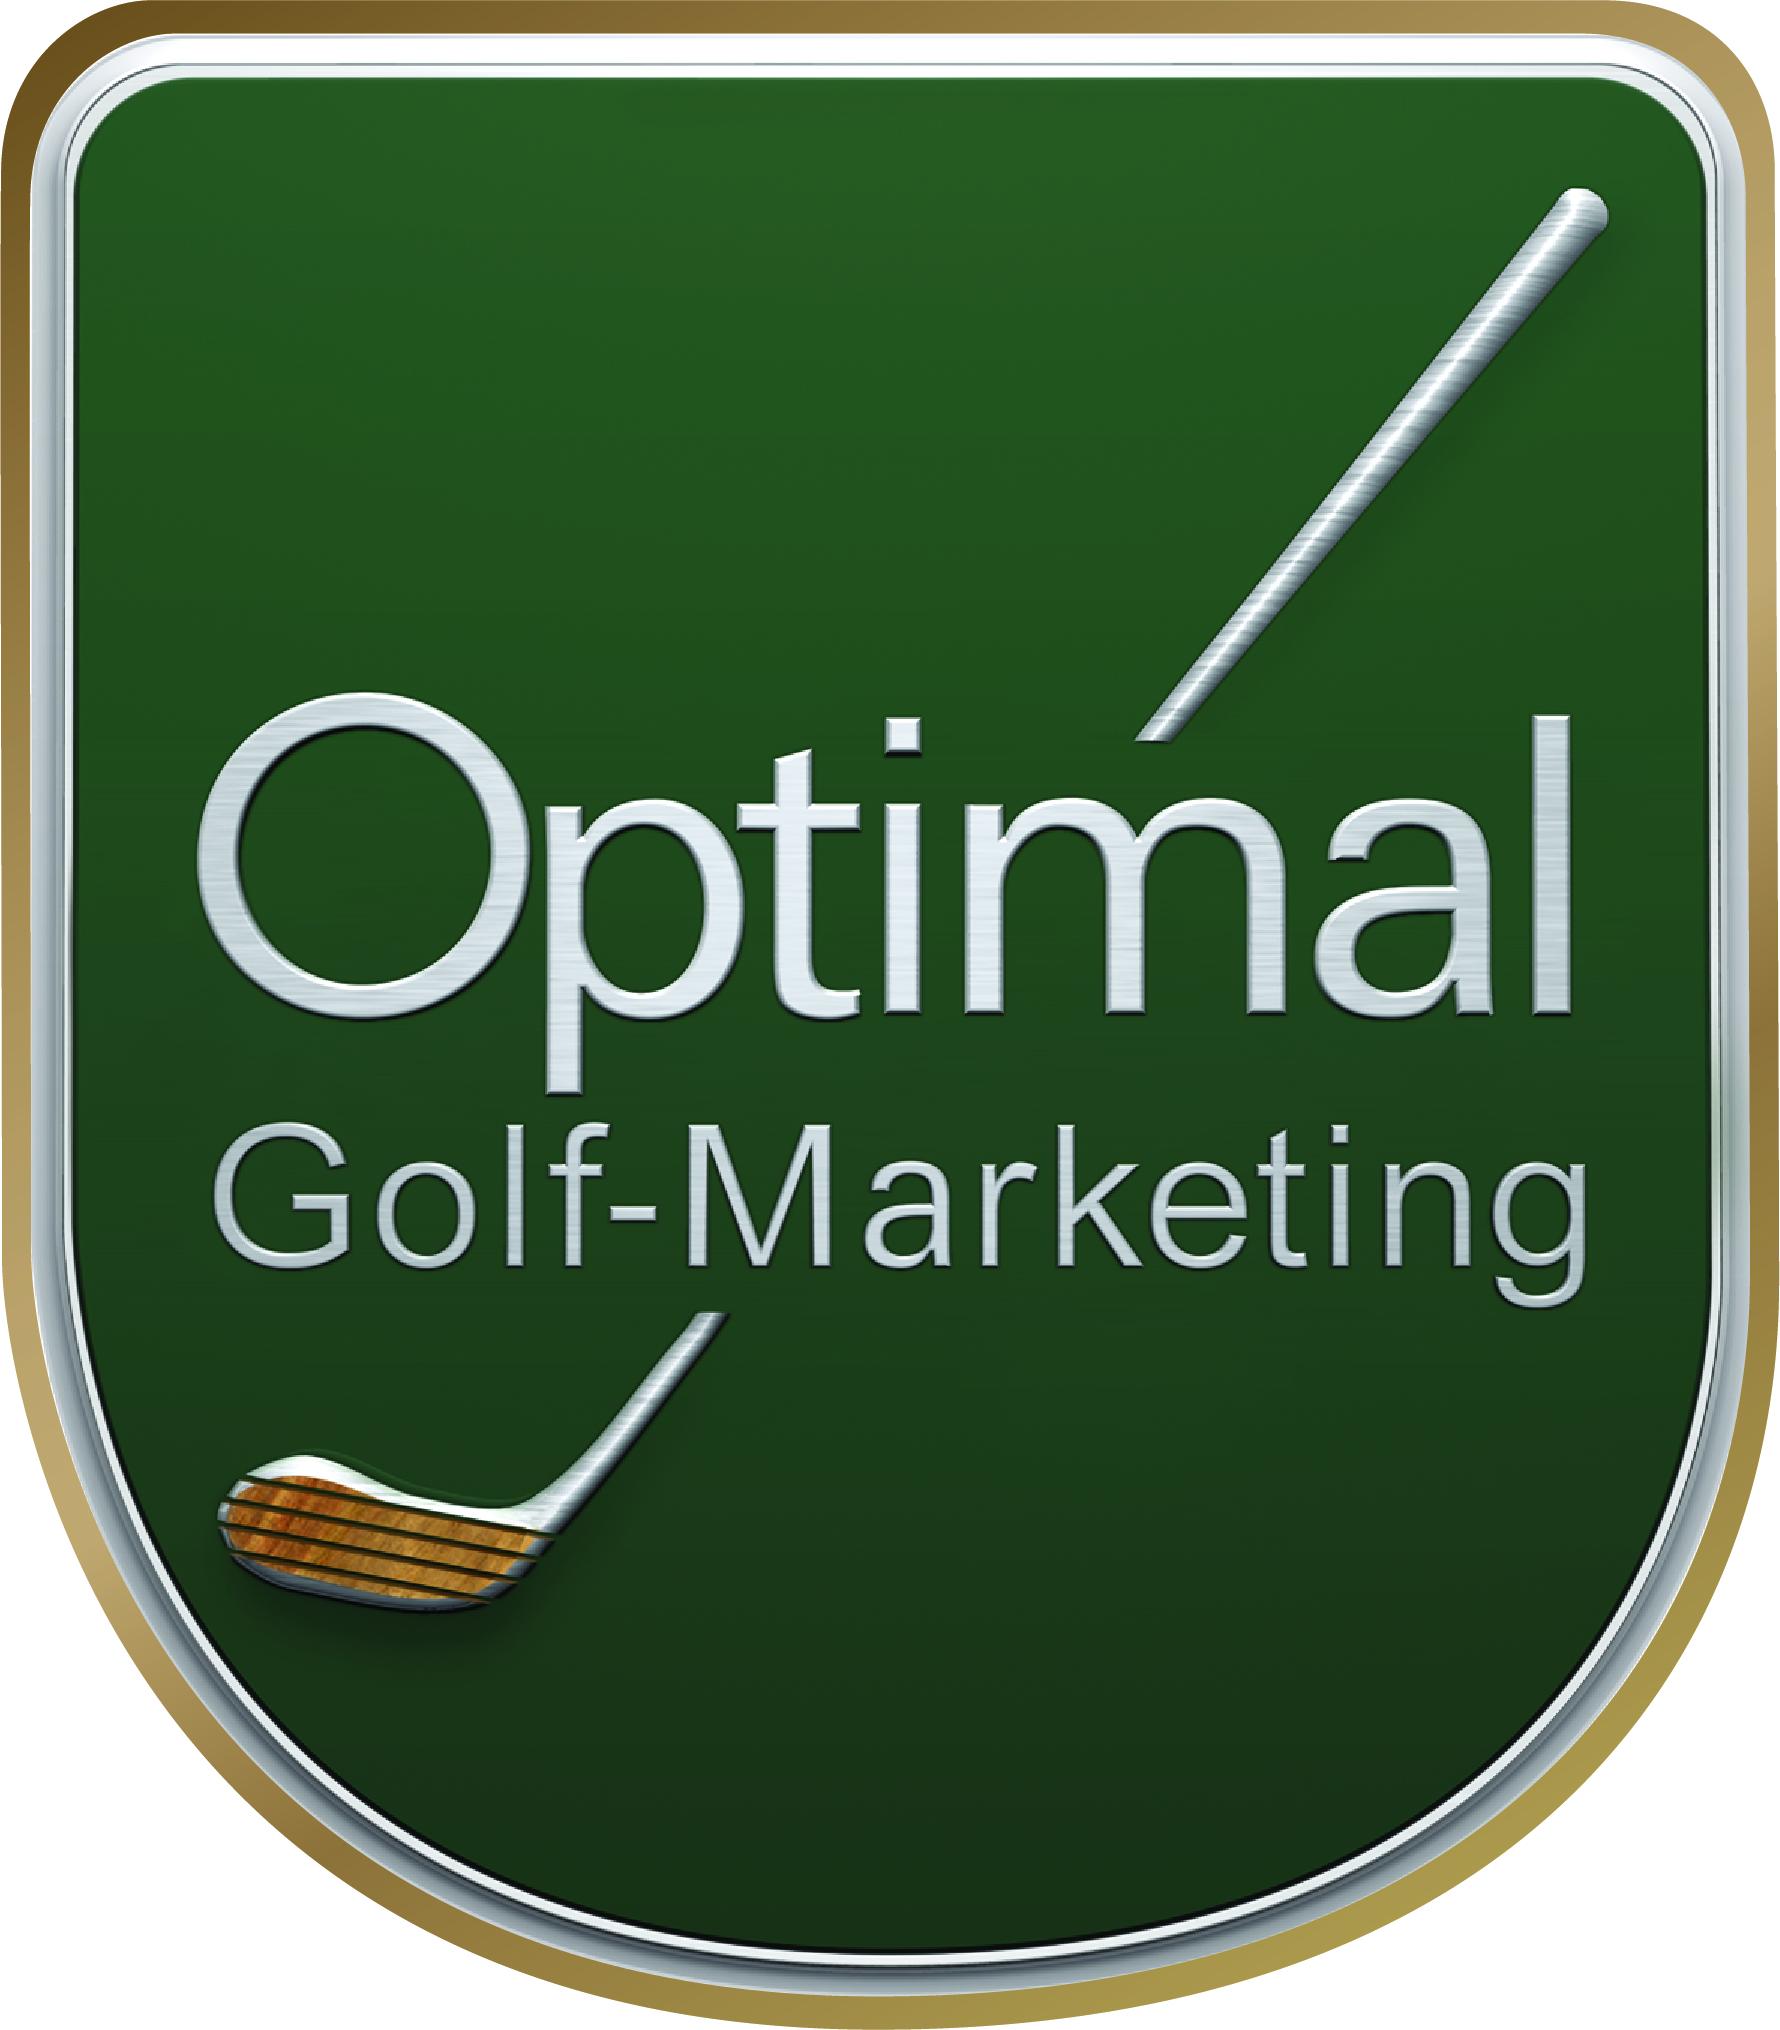 Optimal Golf Marketing Paletta & Co. oHG